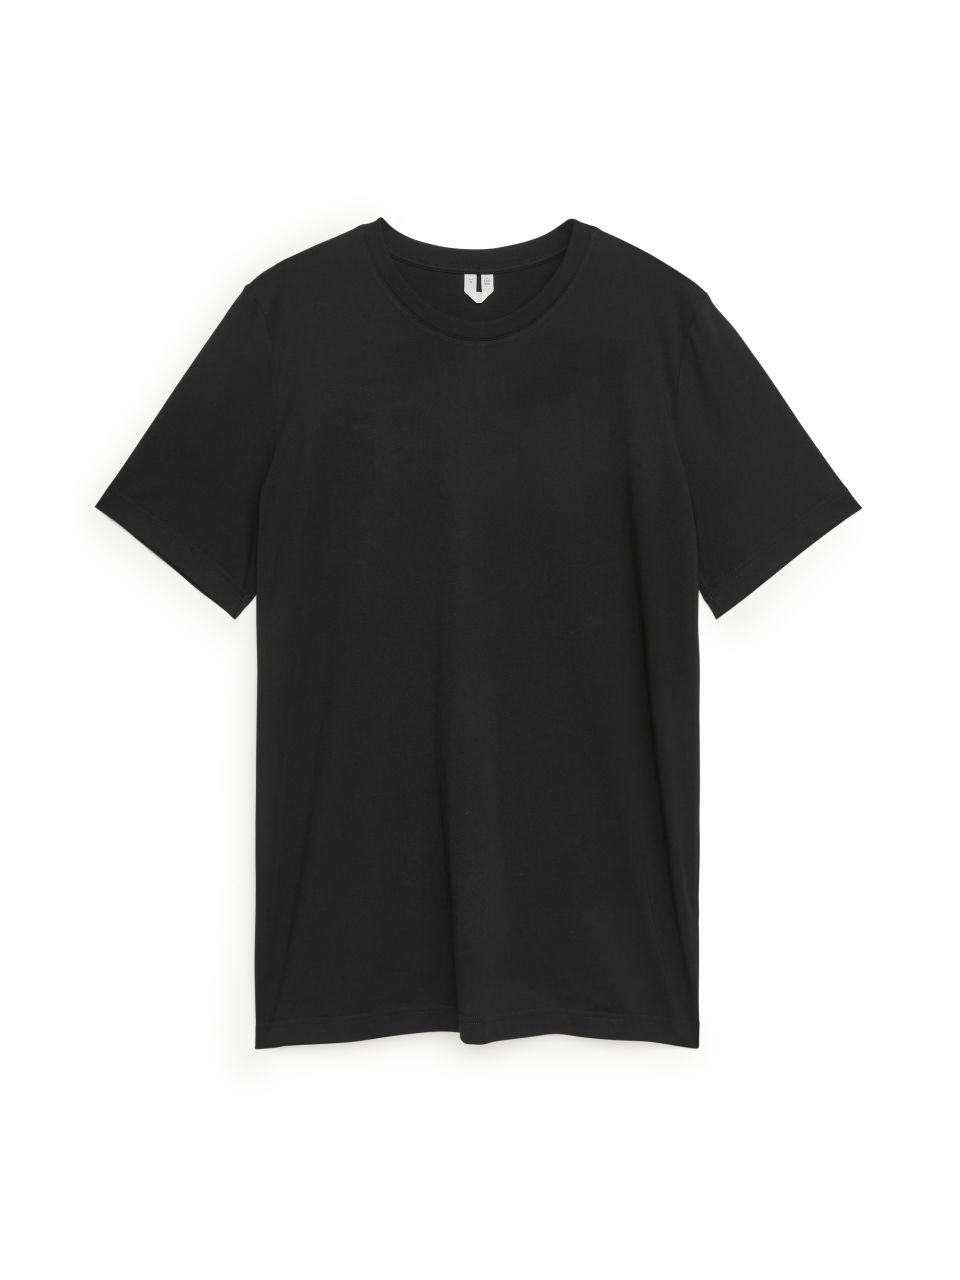 Pima Cotton T-Shirt - Black